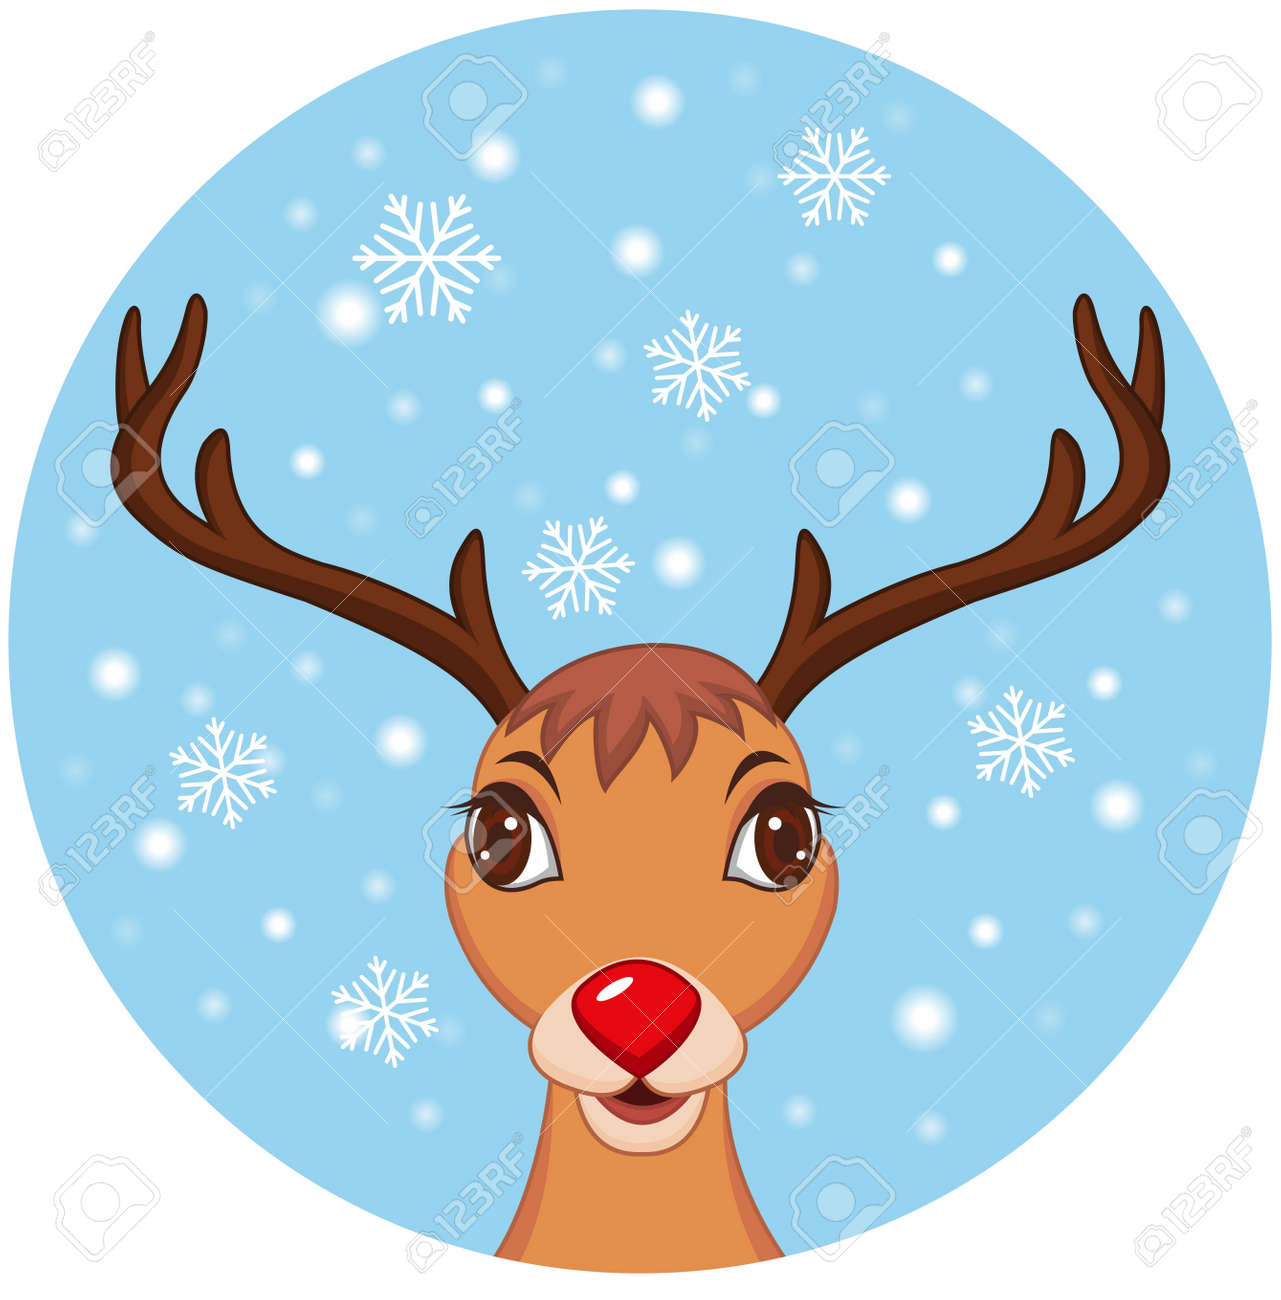 illustration of Cute Christmas Reindeer Stock Vector - 14320738